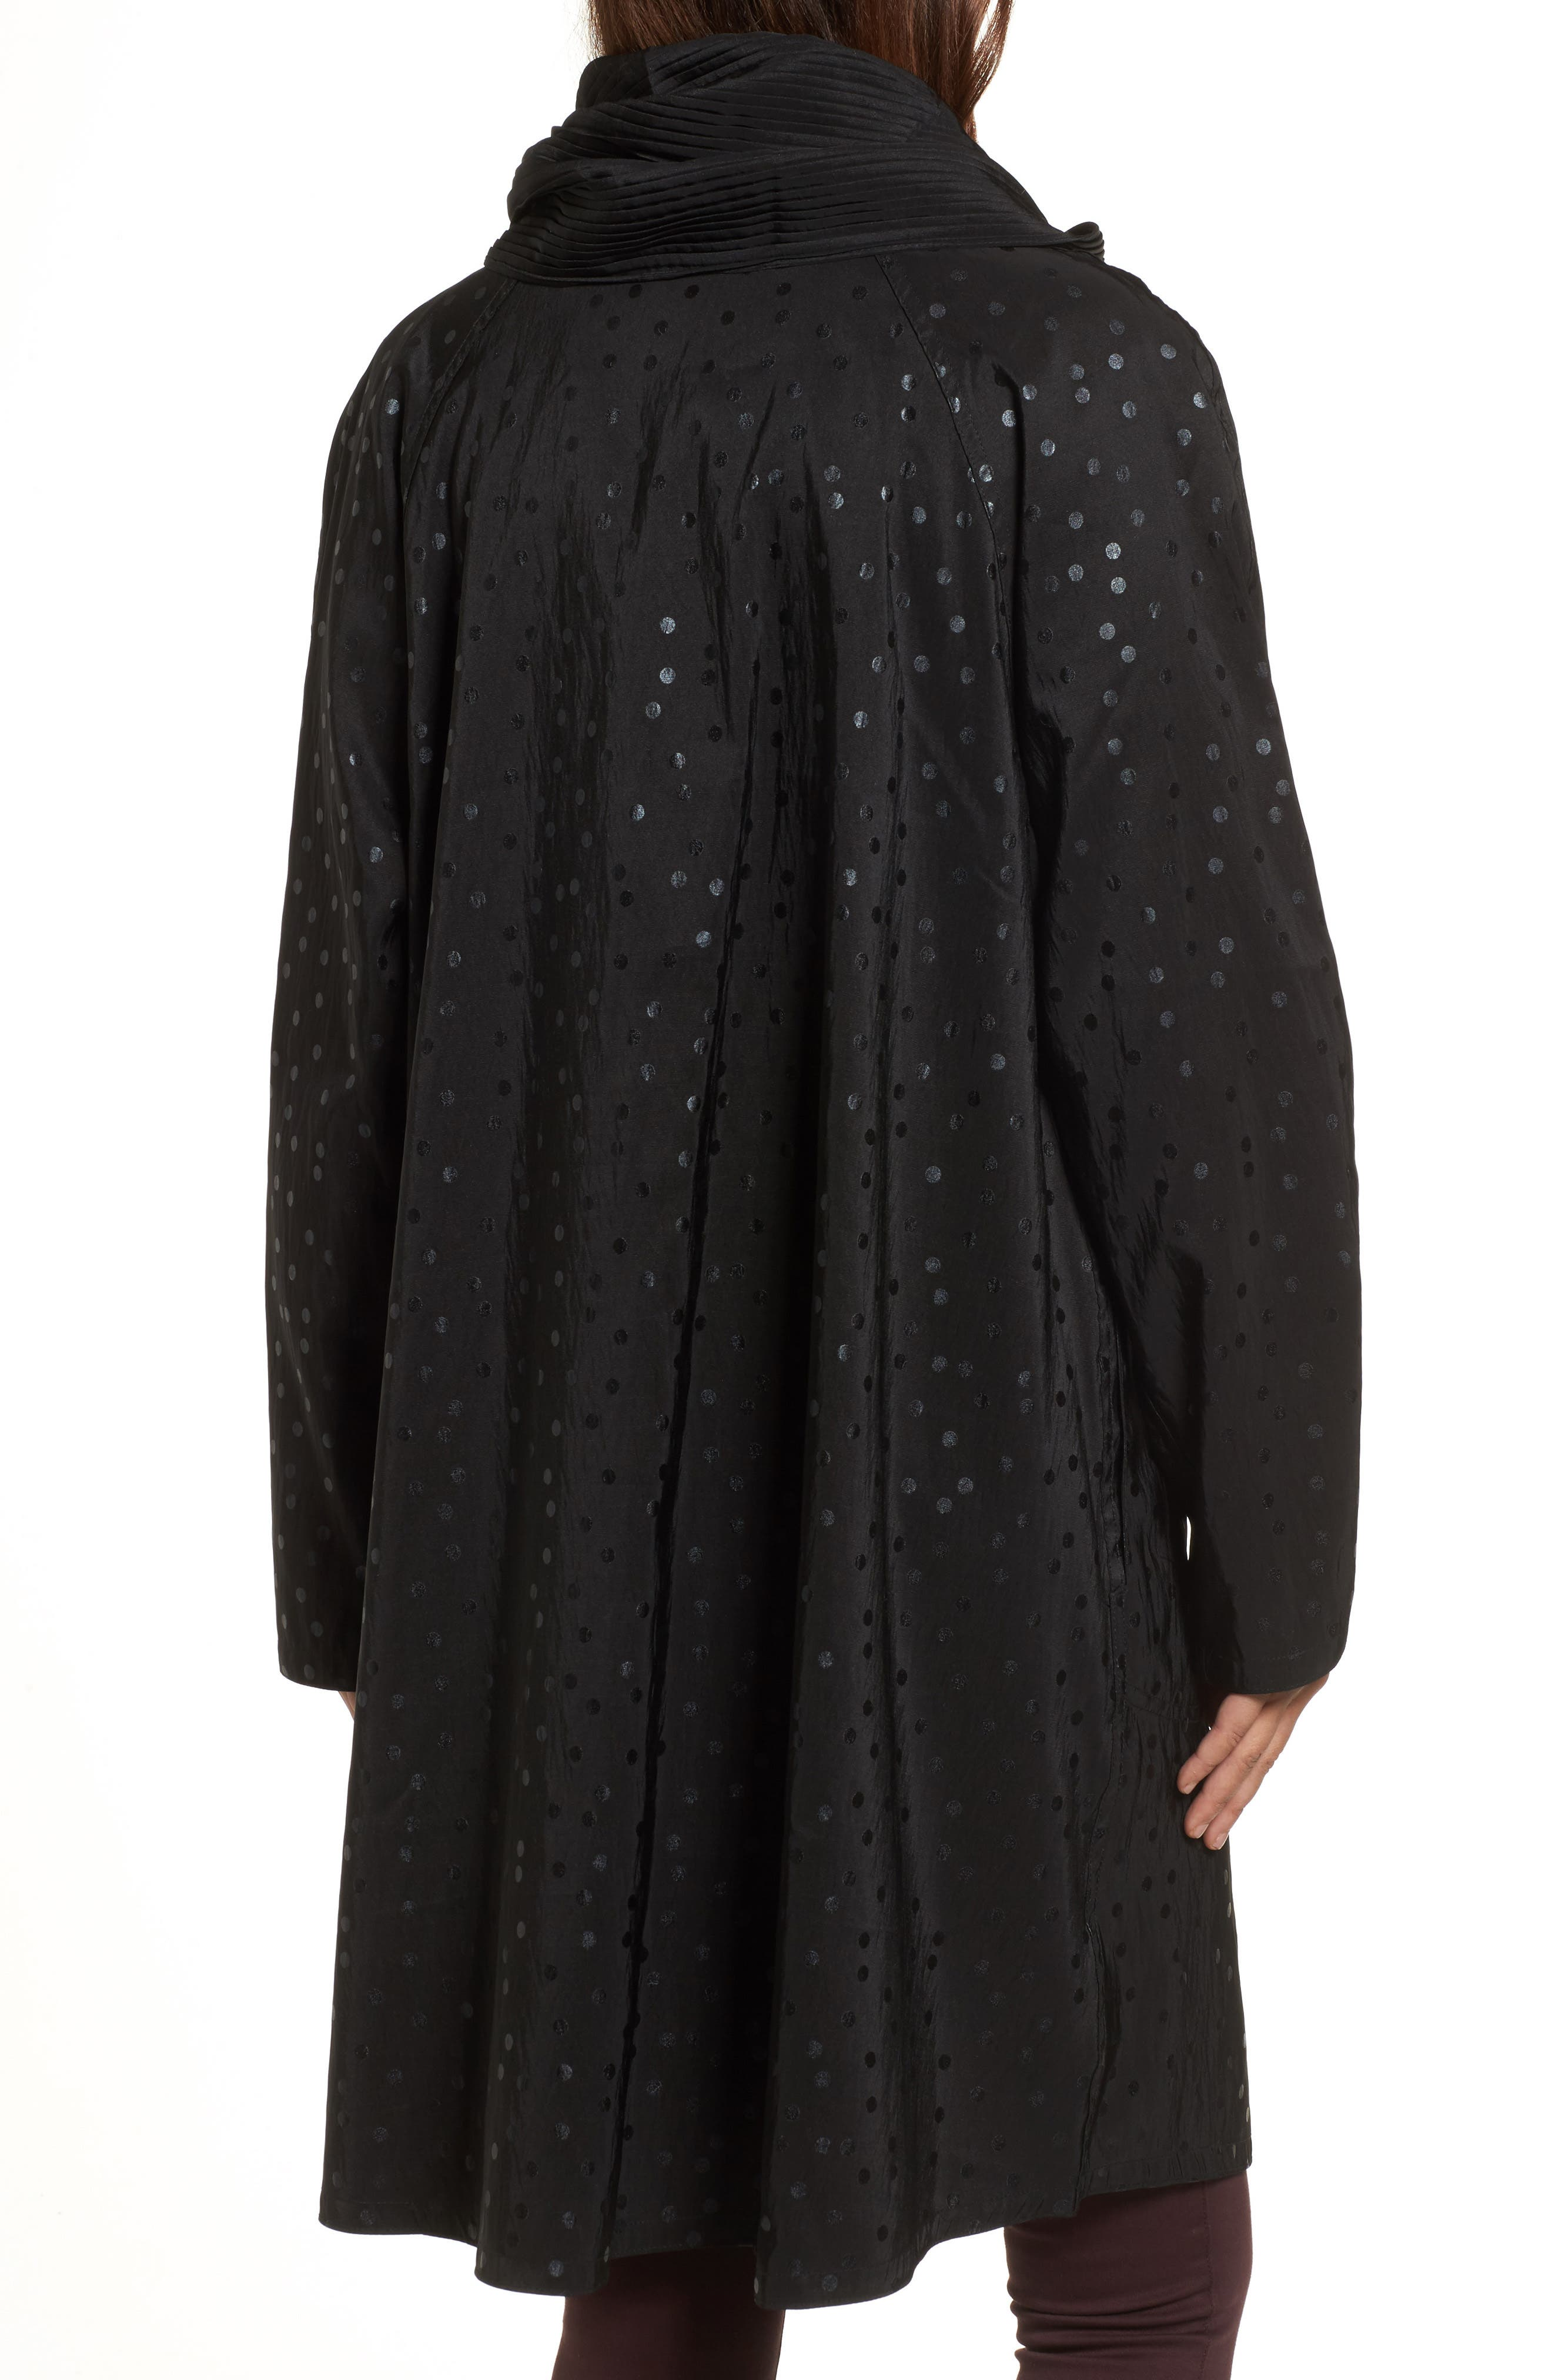 Alternate Image 2  - Mycra Pac Designer Wear 'Donatella' Reversible Dot Pleat Hood Packable Travel Coat